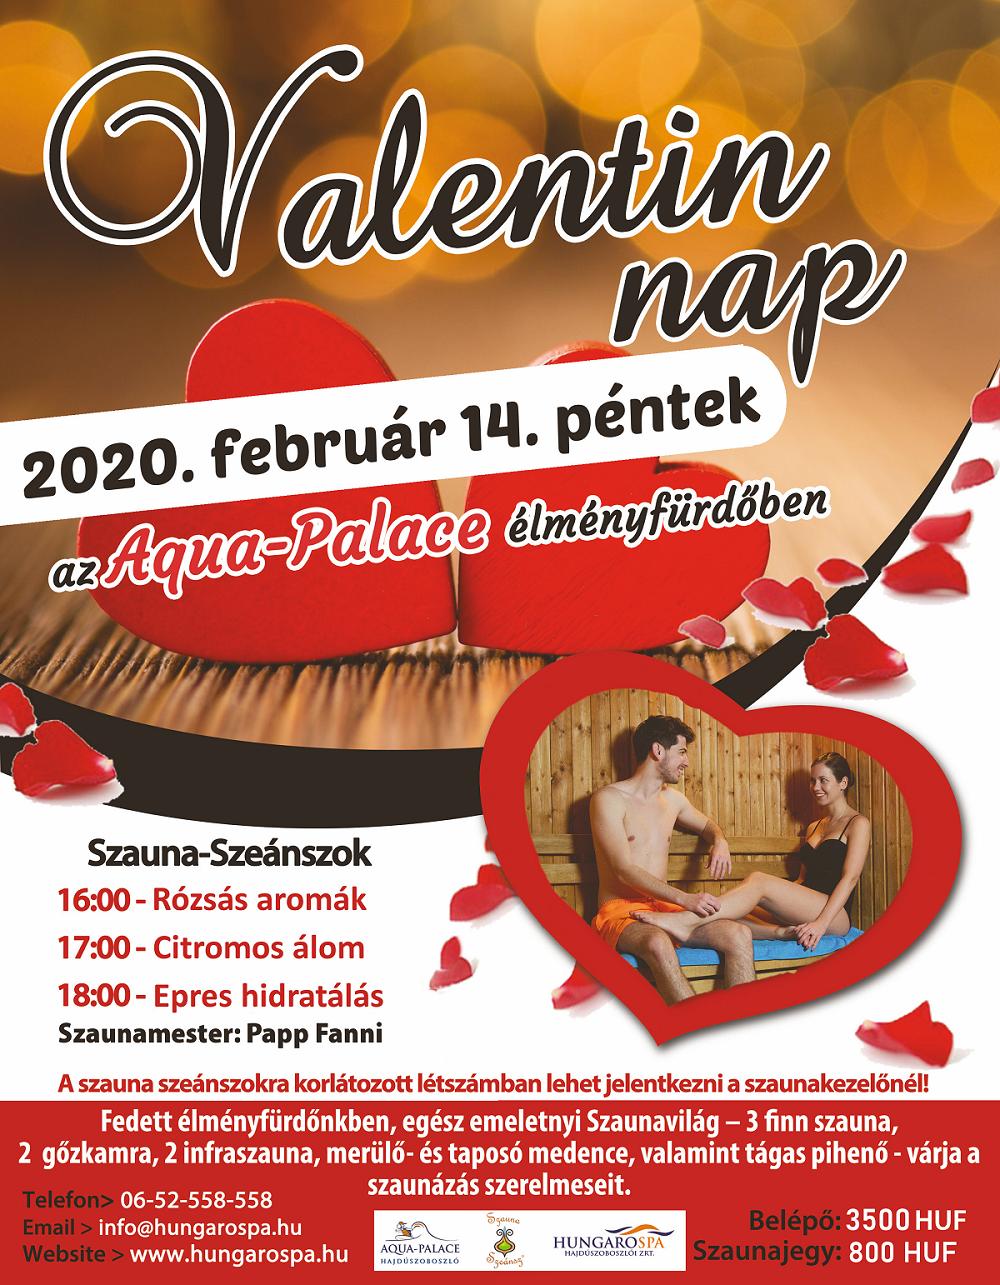 Valentin nap 2020 1000